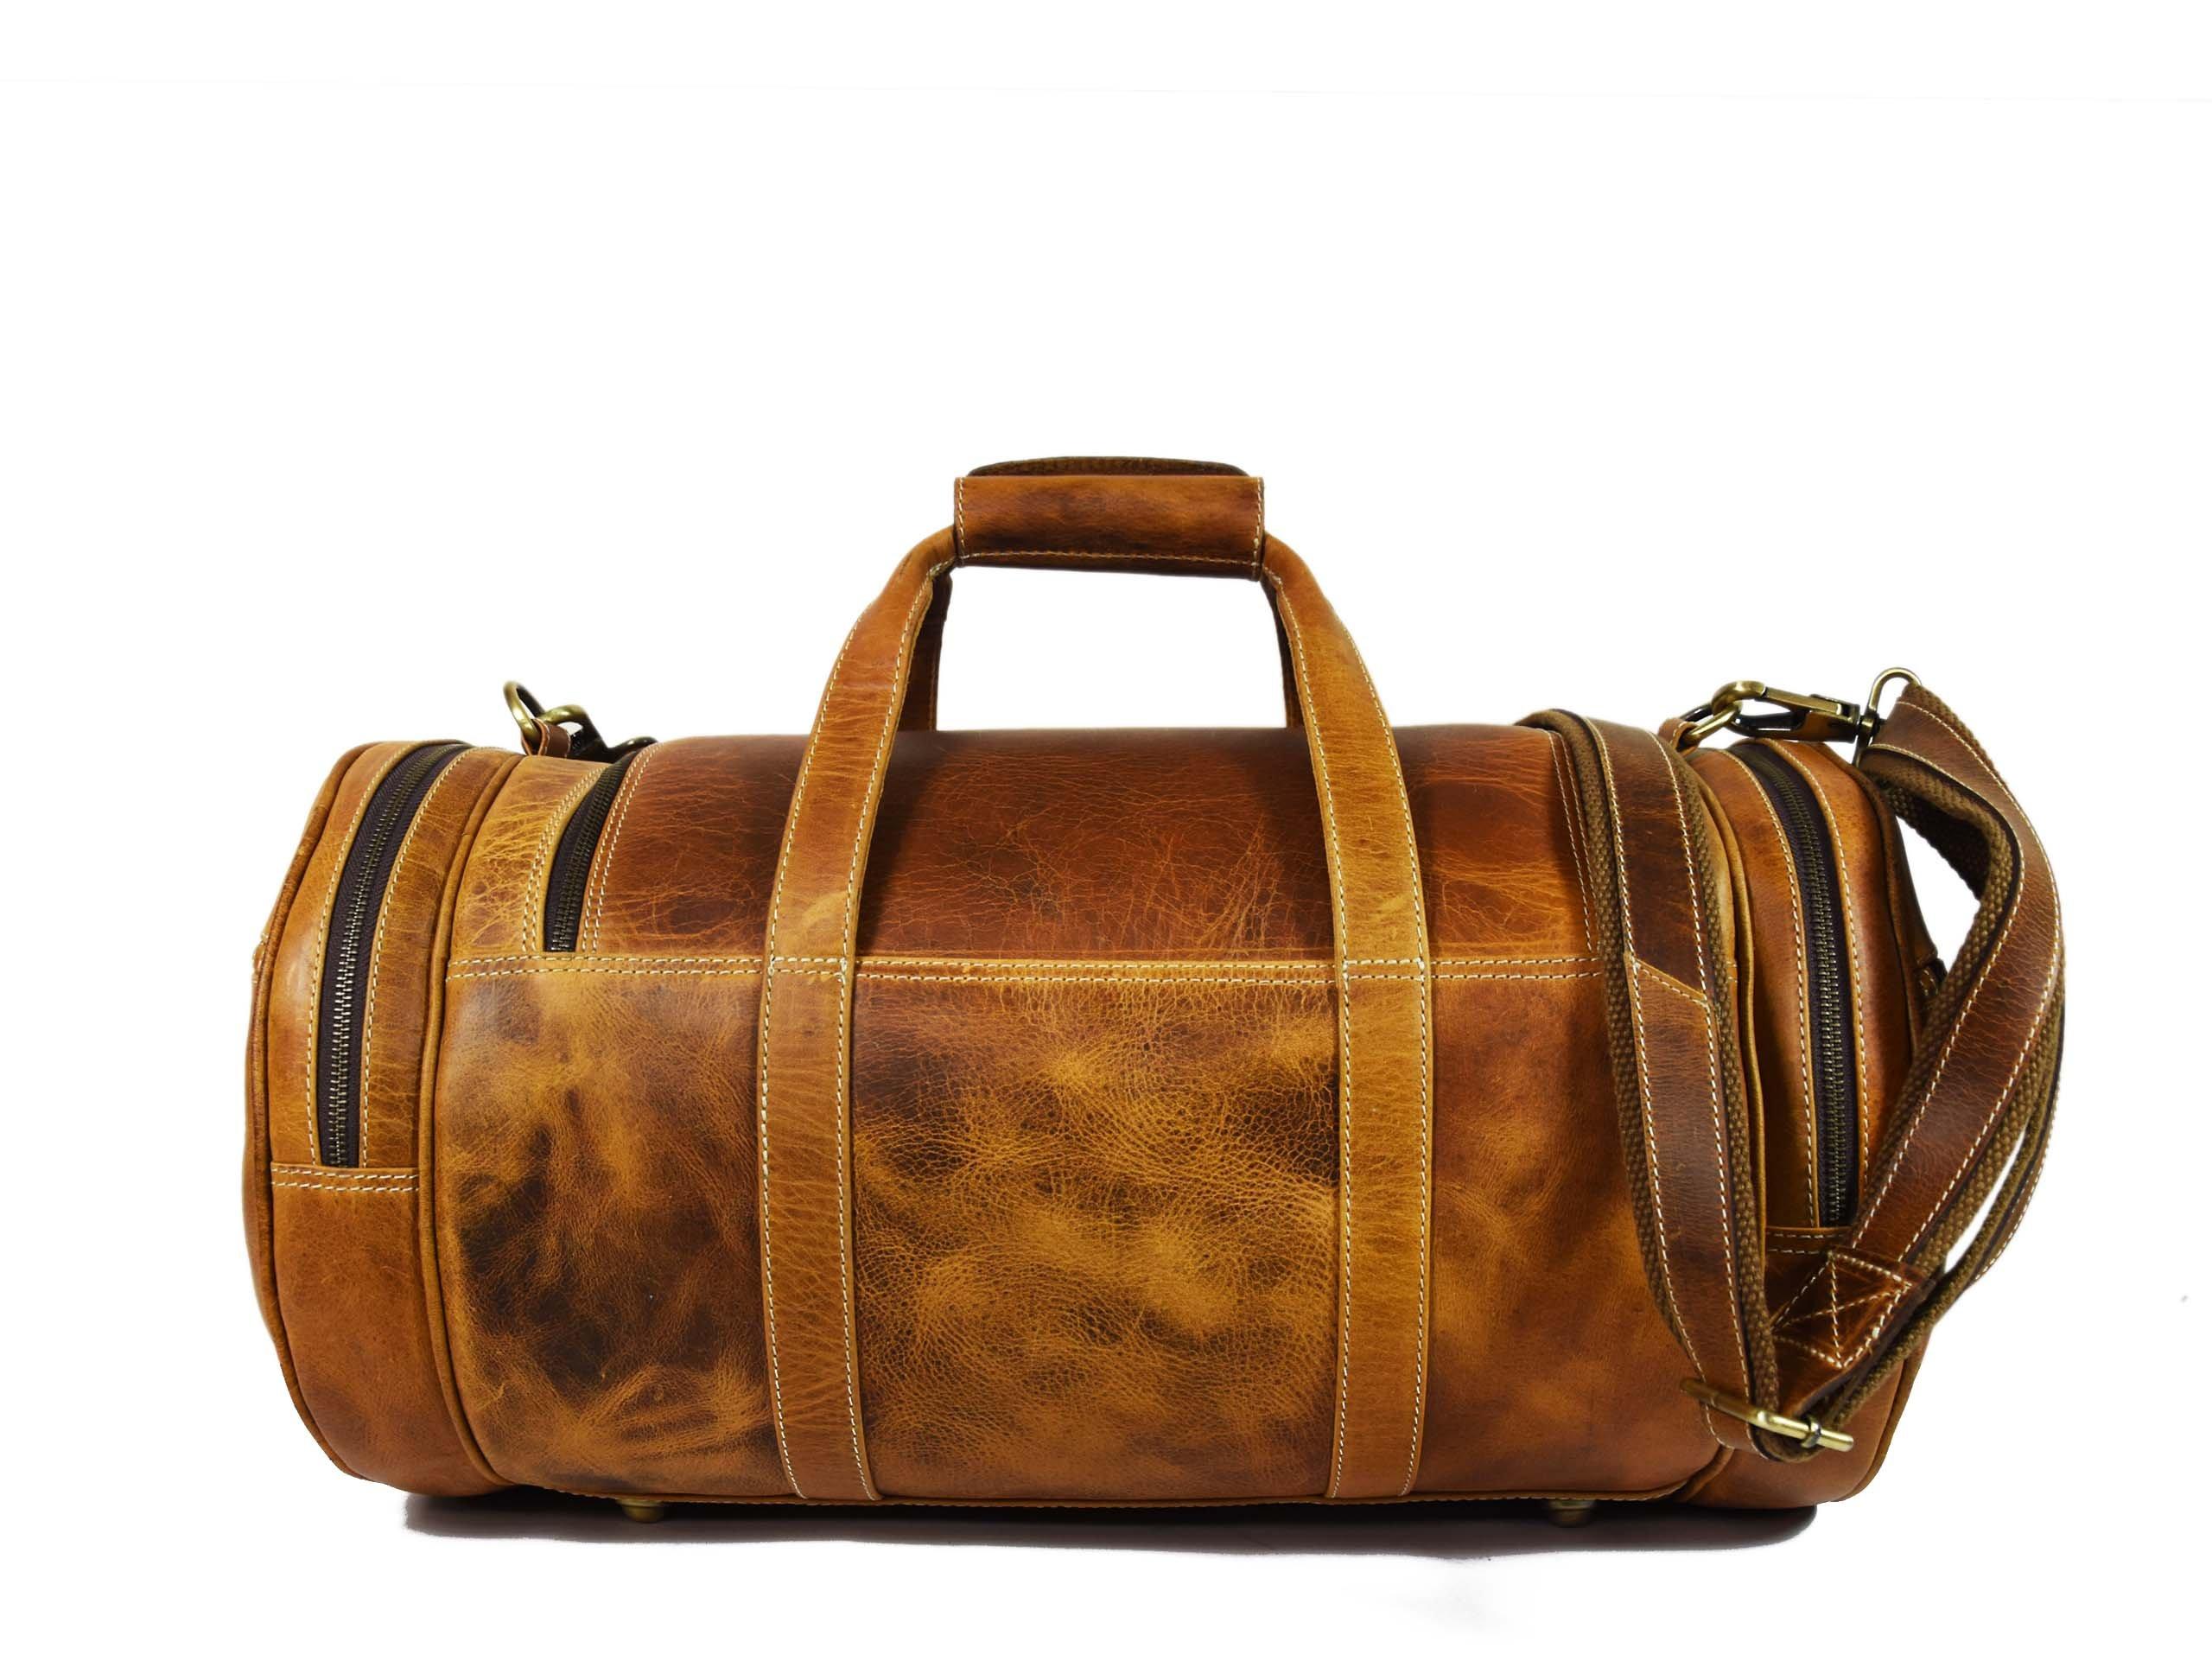 Travel Duffel Overnight Barrel Weekend Leather Bag by Aaron Leather (Brown) by Aaron Leather (Image #3)